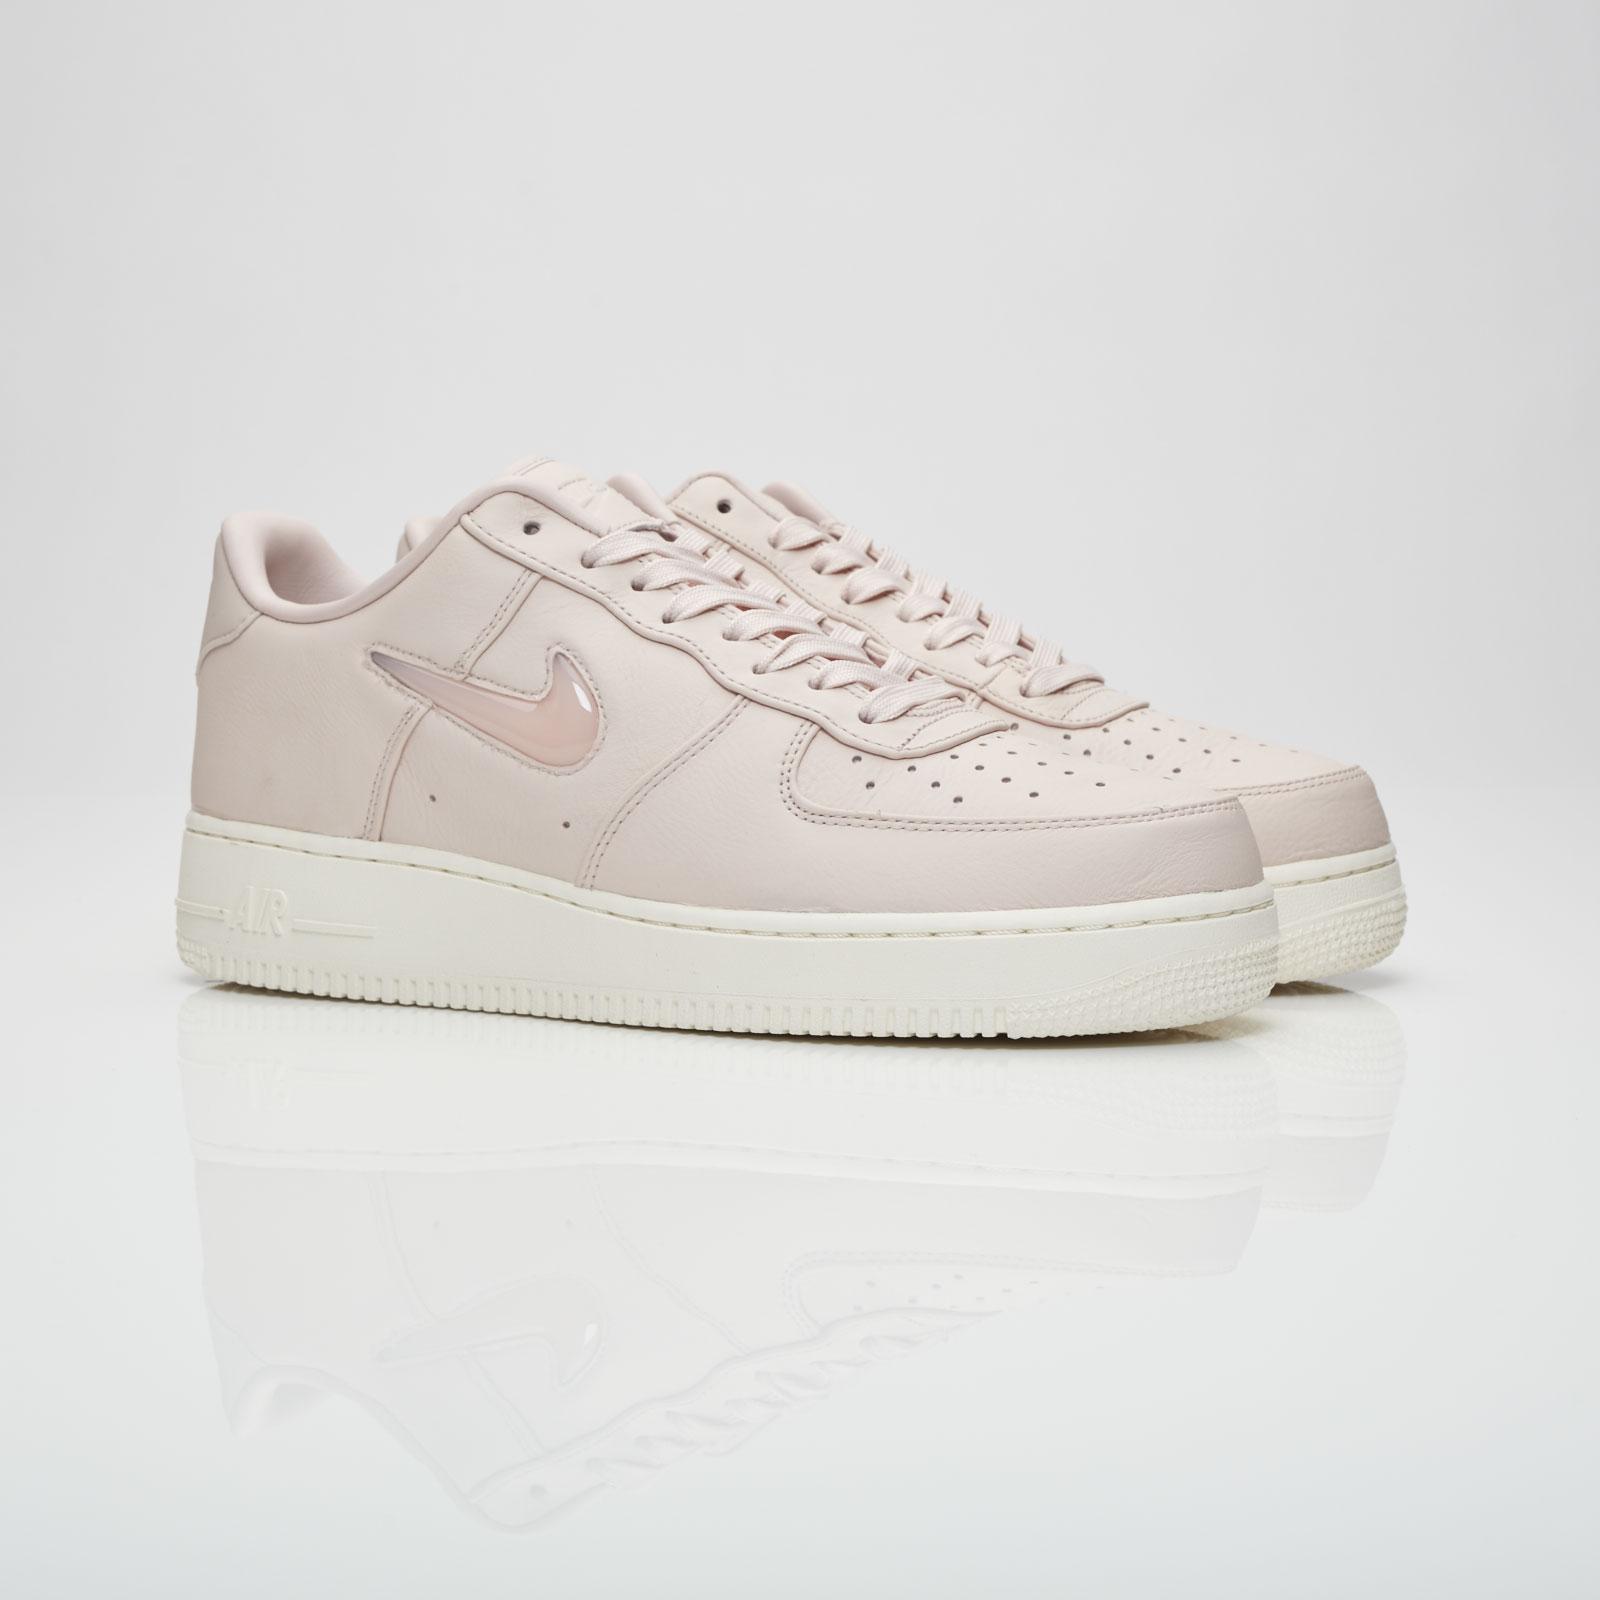 Nike Air Force 1 Retro Premium - 941912